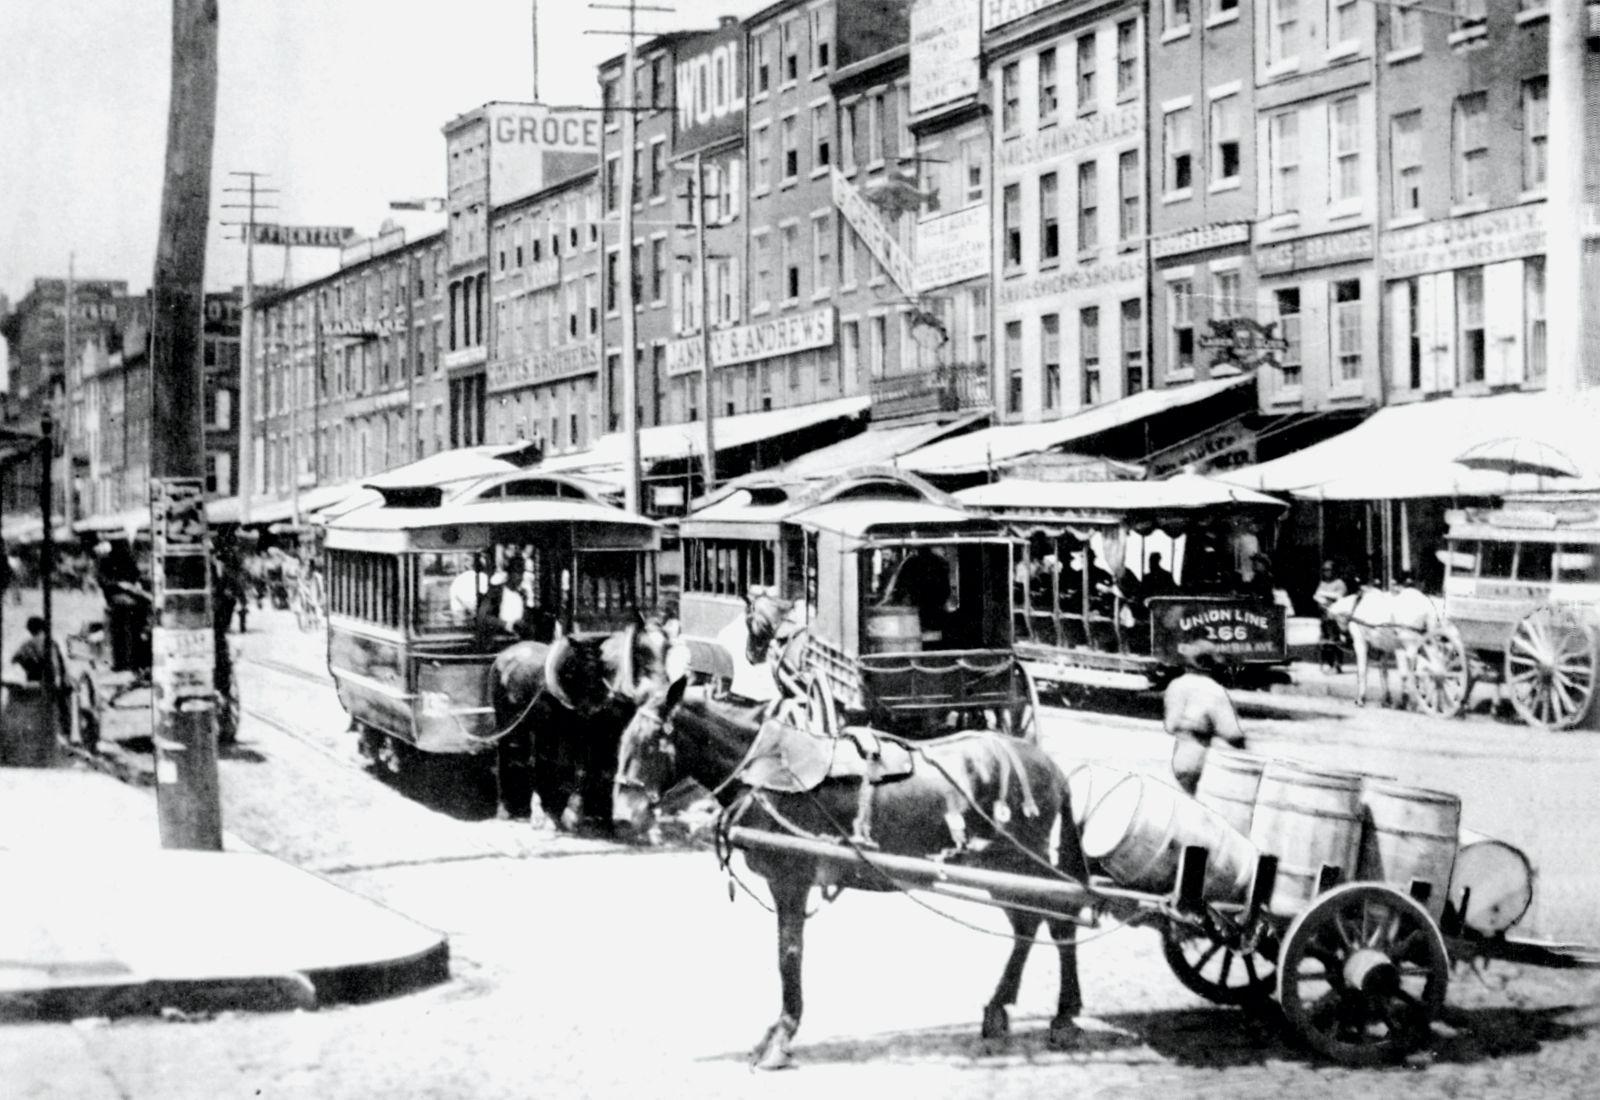 Horse Cart With Barrels, Philadelphia, PA